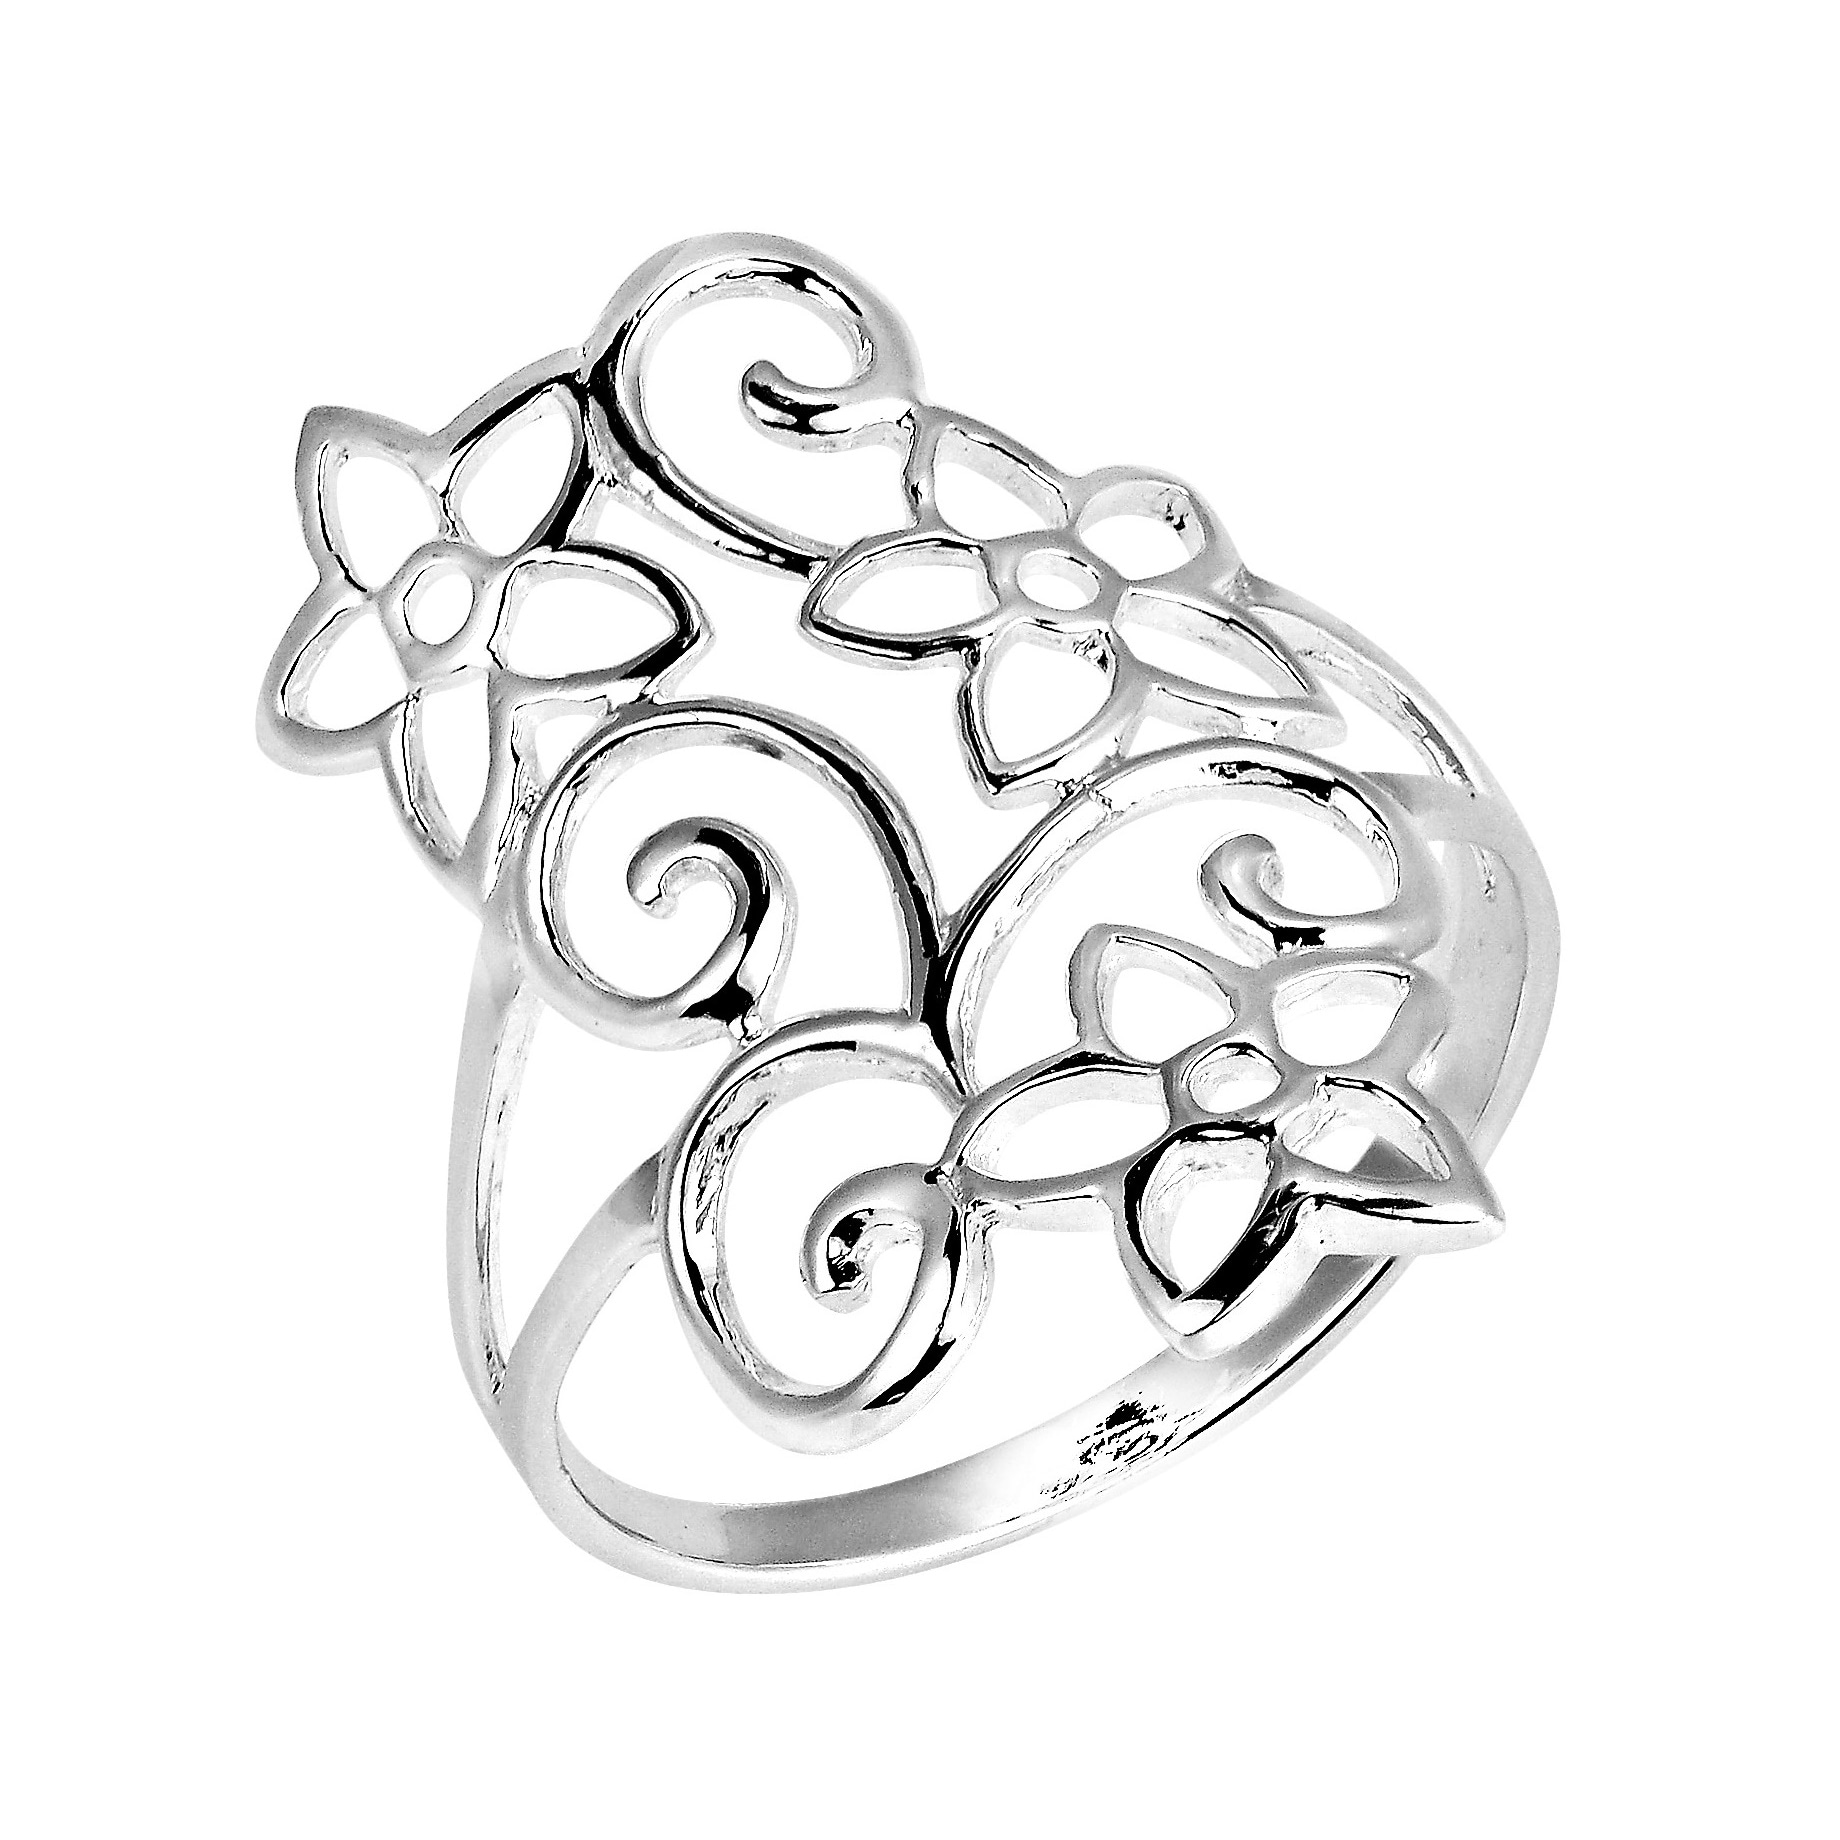 Swirling Jasmine Flower Garden .925 Sterling Silver Ring (Thailand)